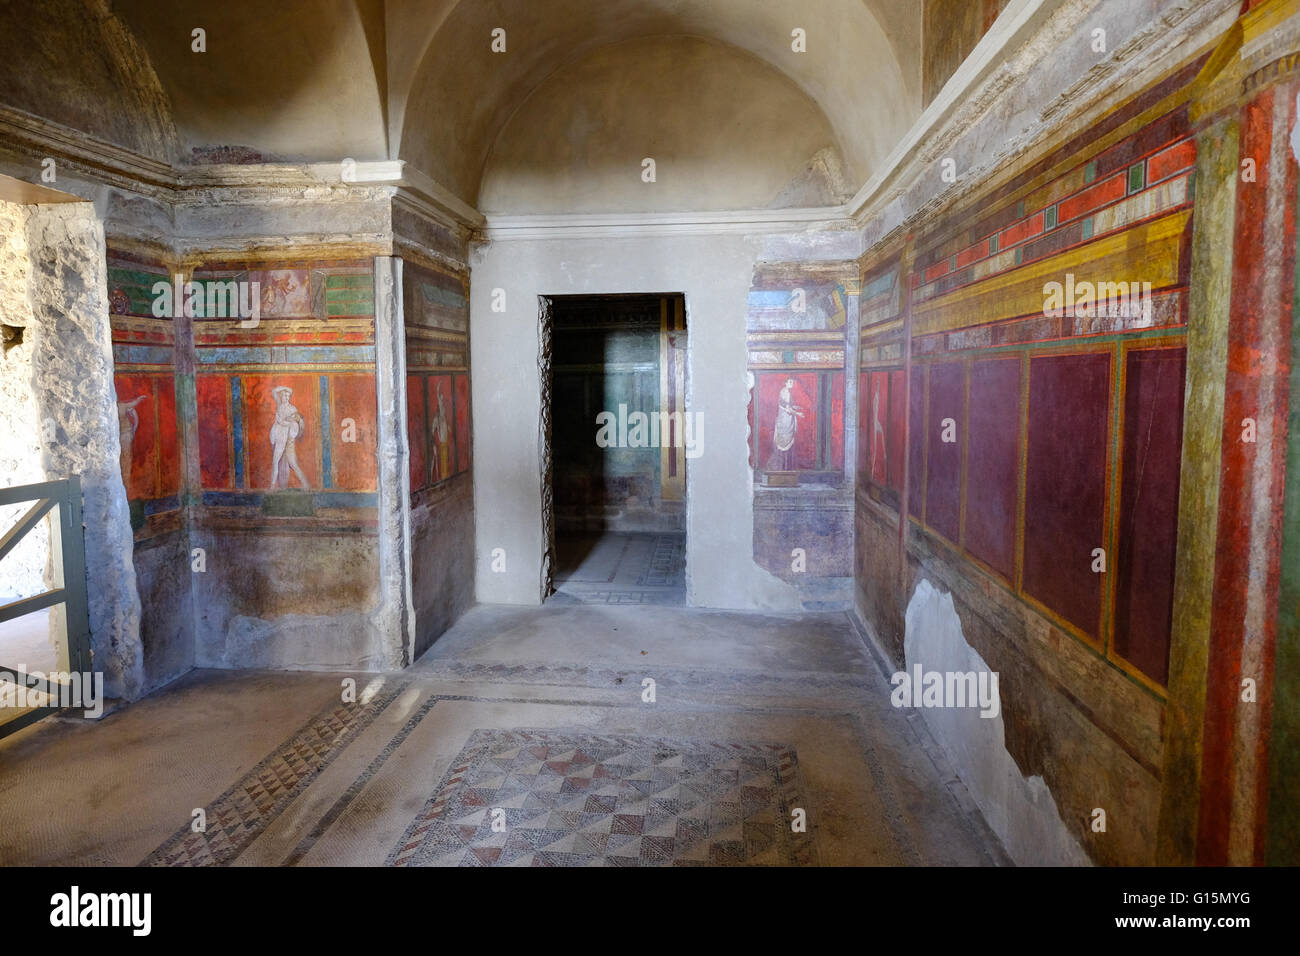 Roman frescoes at Villa of the Mysteries, Pompeii, UNESCO World Heritage Site, the ancient Roman town near Naples, - Stock Image